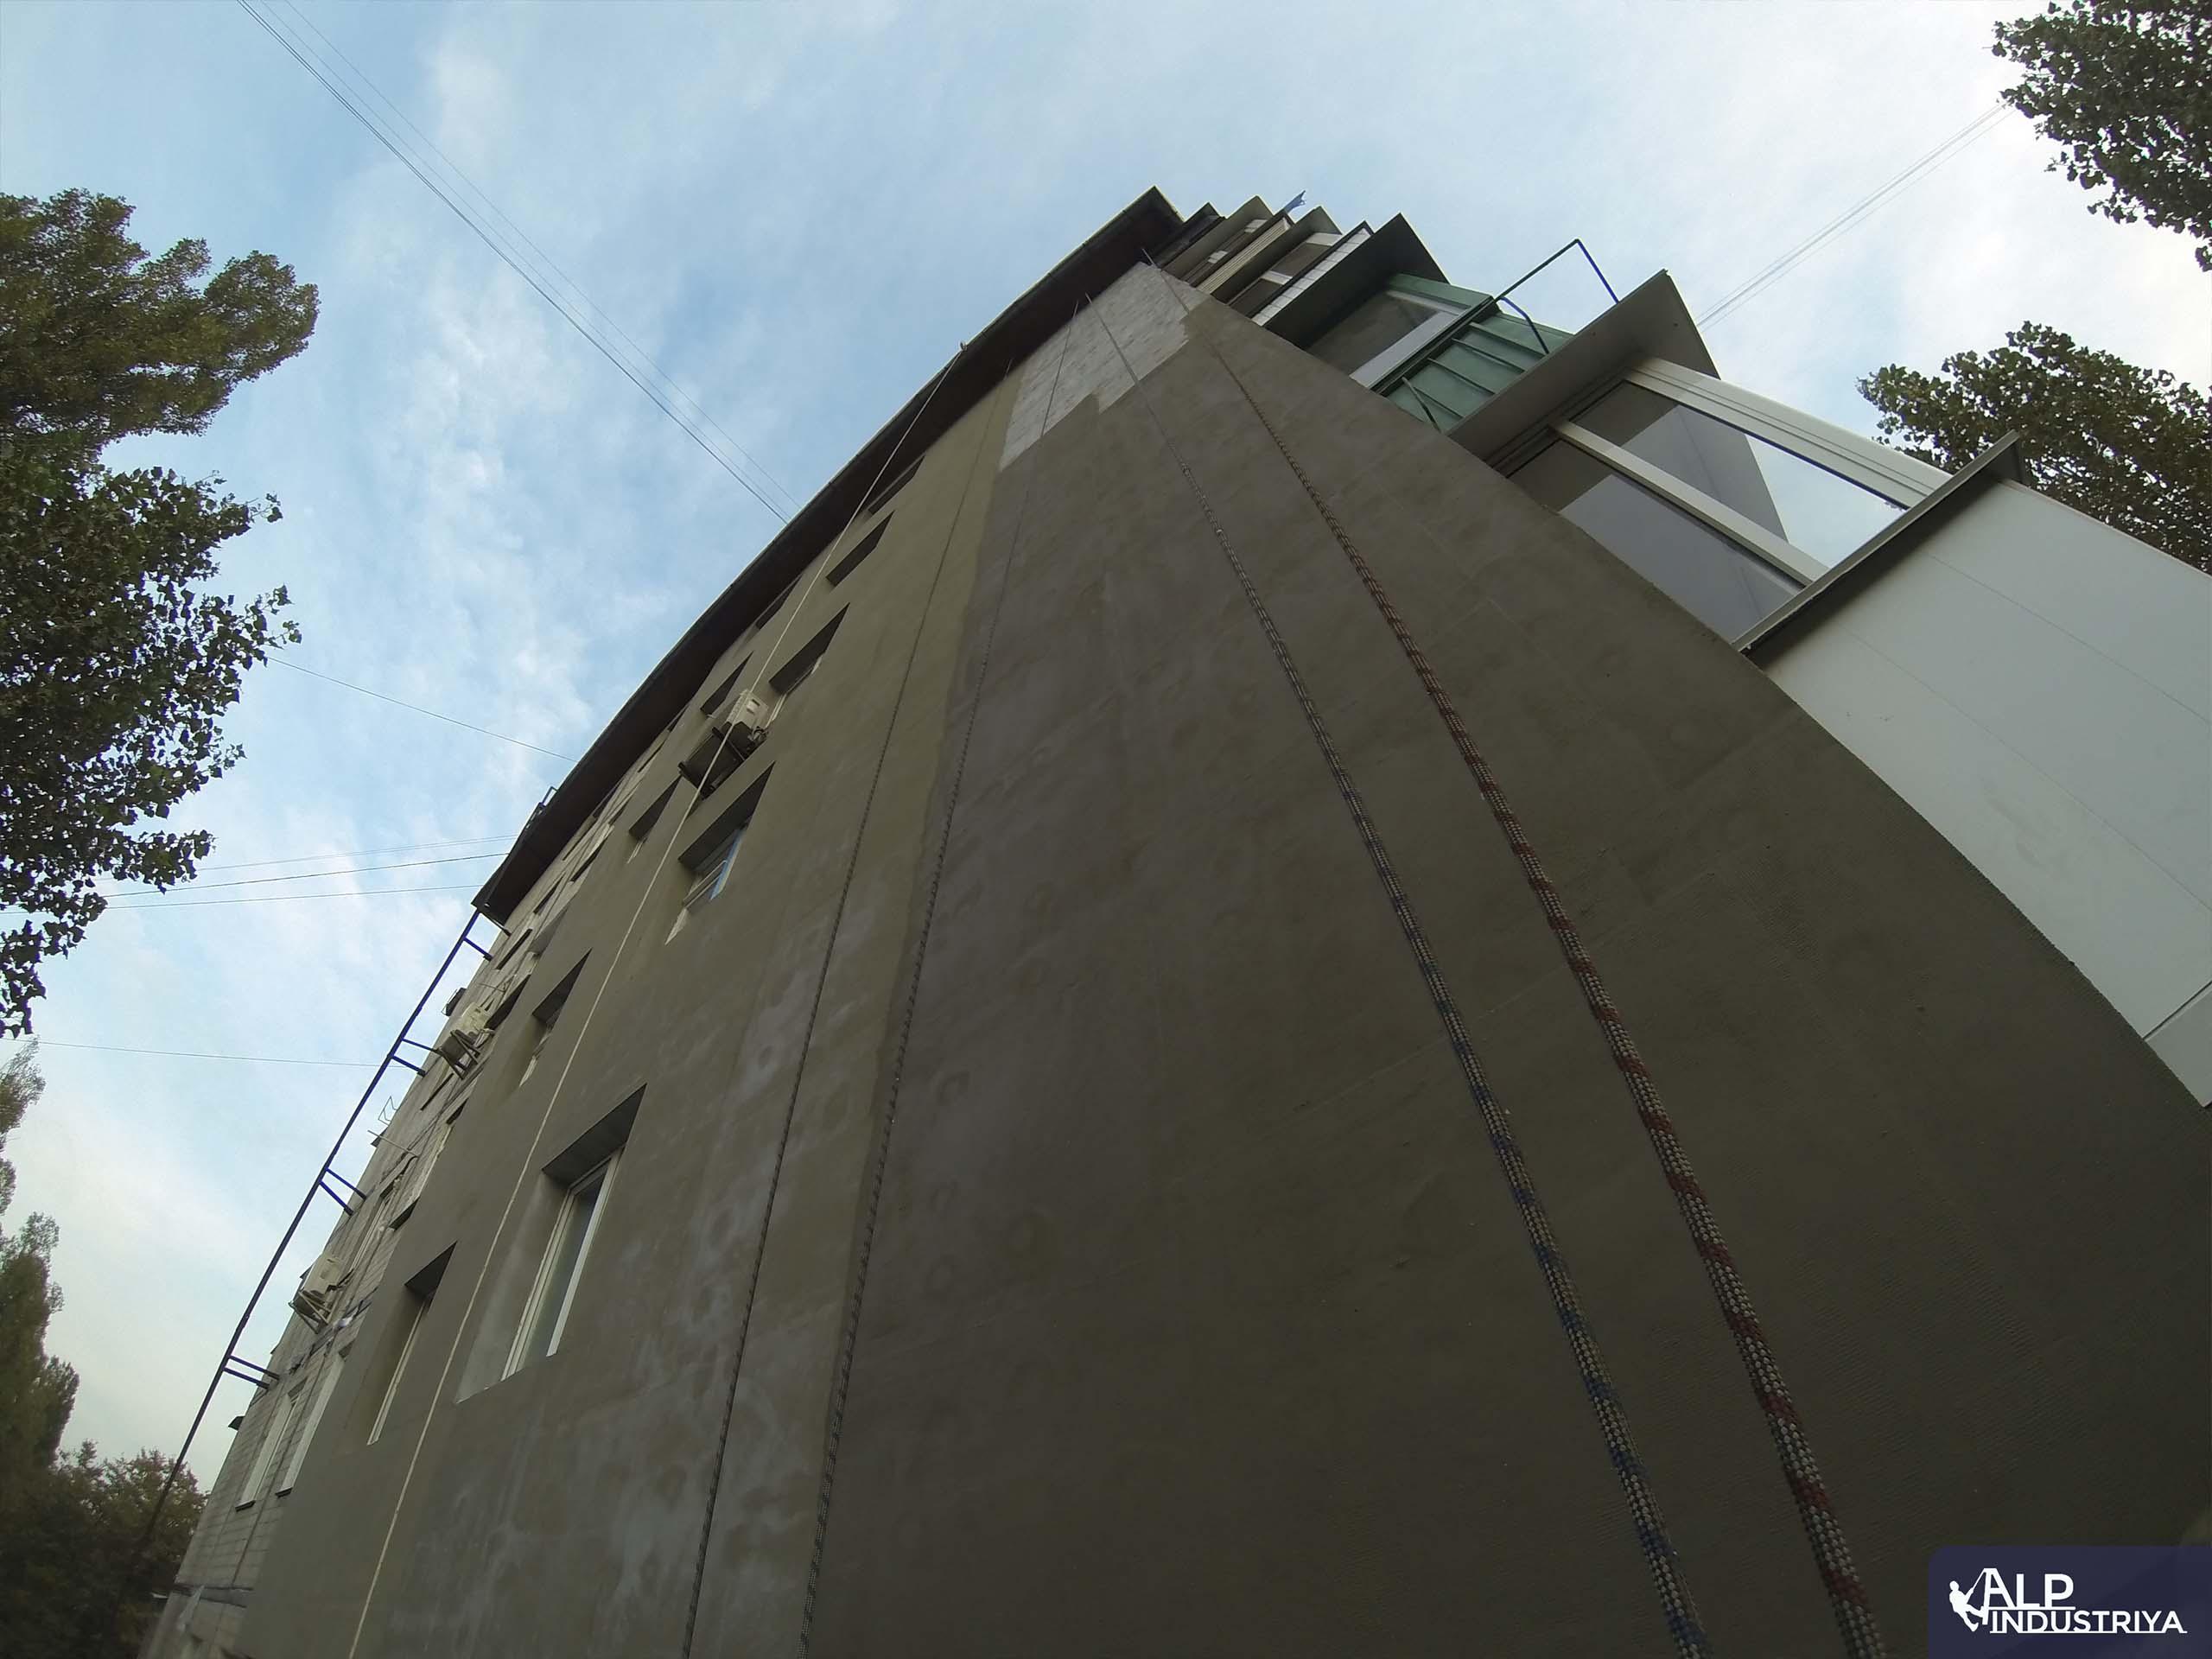 Теплоизоляция стен и углов многоквартирного дома промальпами-2